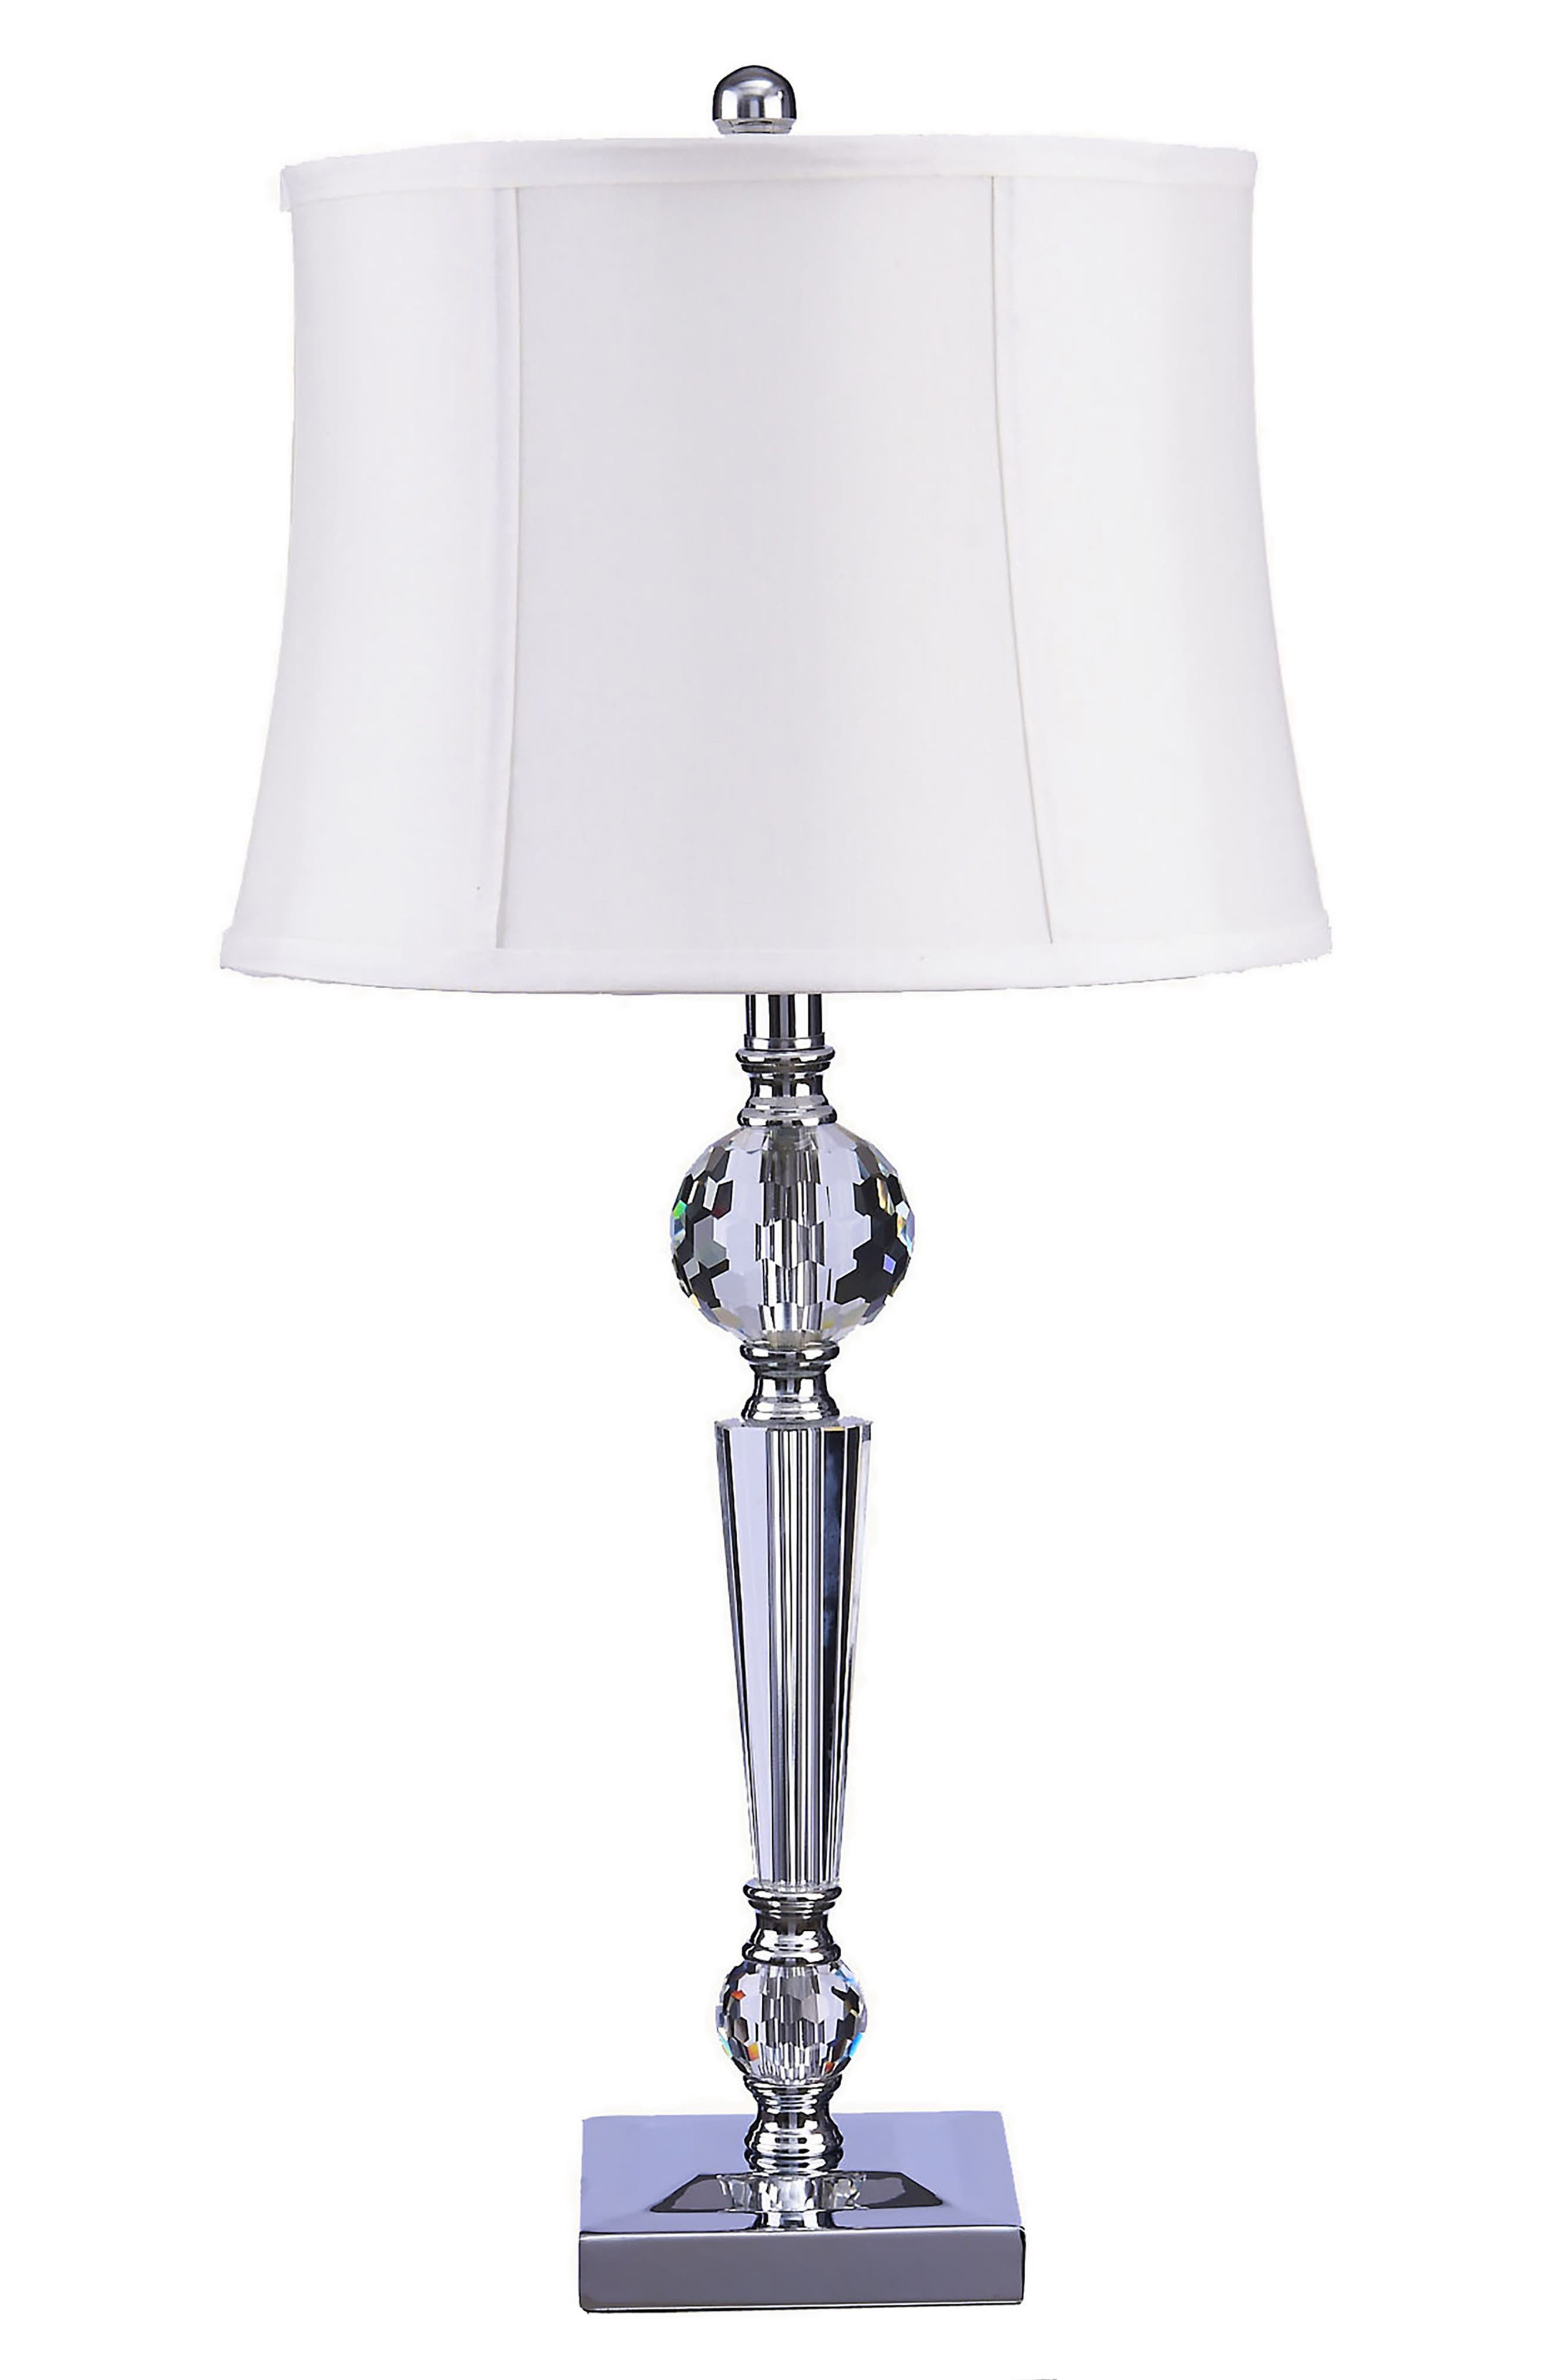 JAlexander Camile Table Lamp,                             Main thumbnail 1, color,                             100